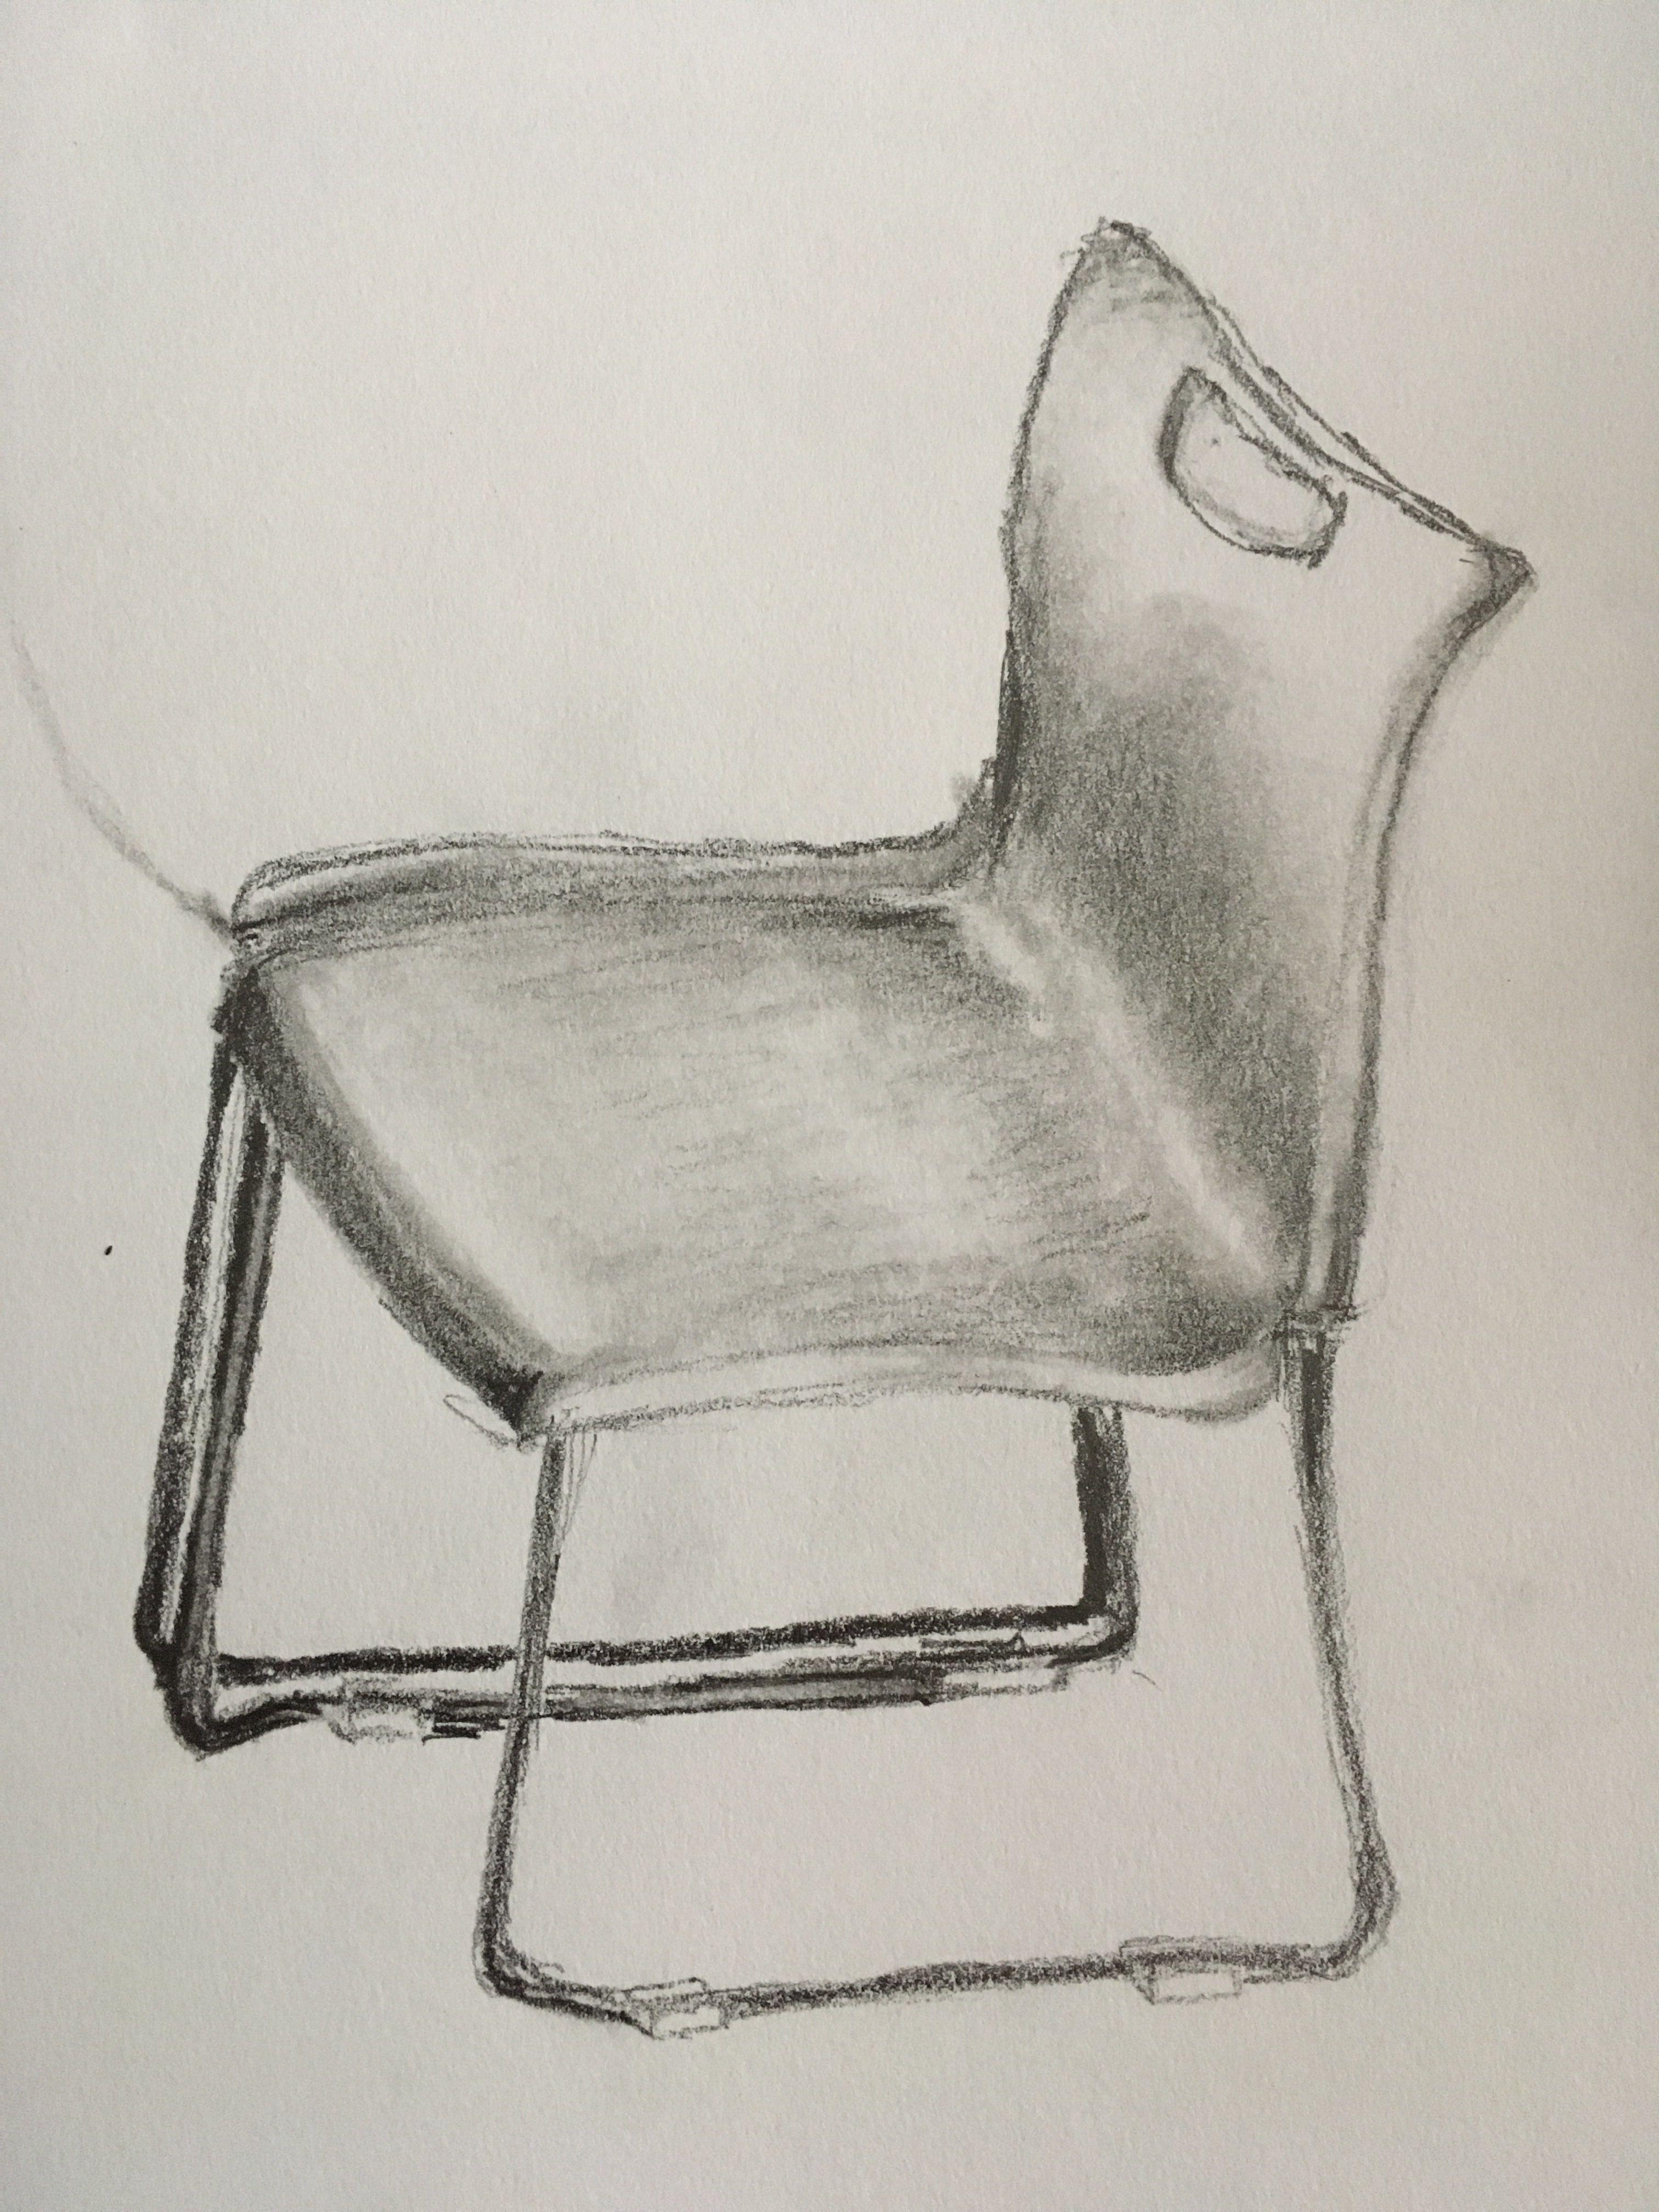 Chair Sketch 20 Minute Pencil Sketch Chair Ghost Chair Pencil Sketch